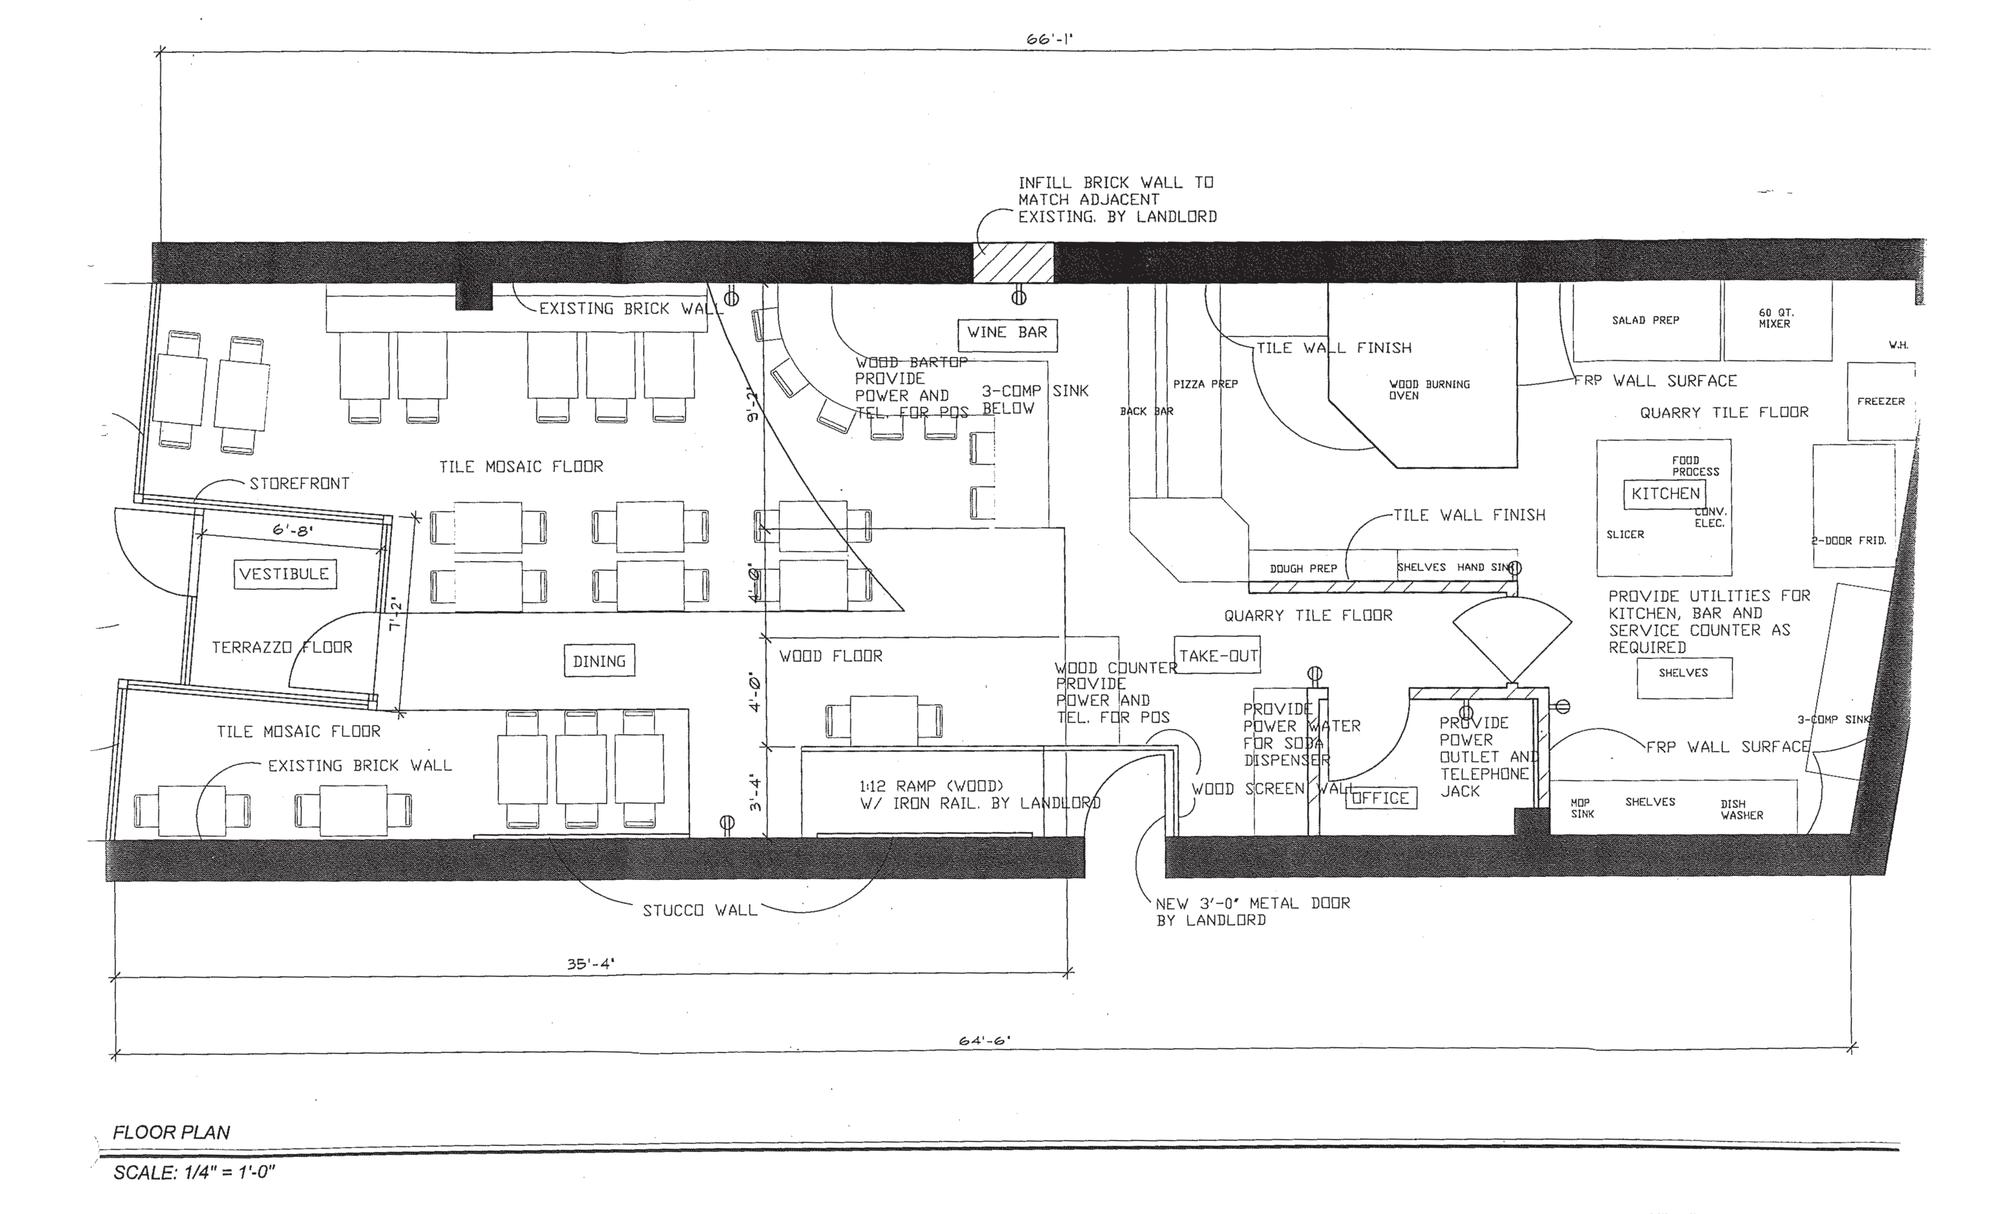 306 E Hennepin Ave Site Plan